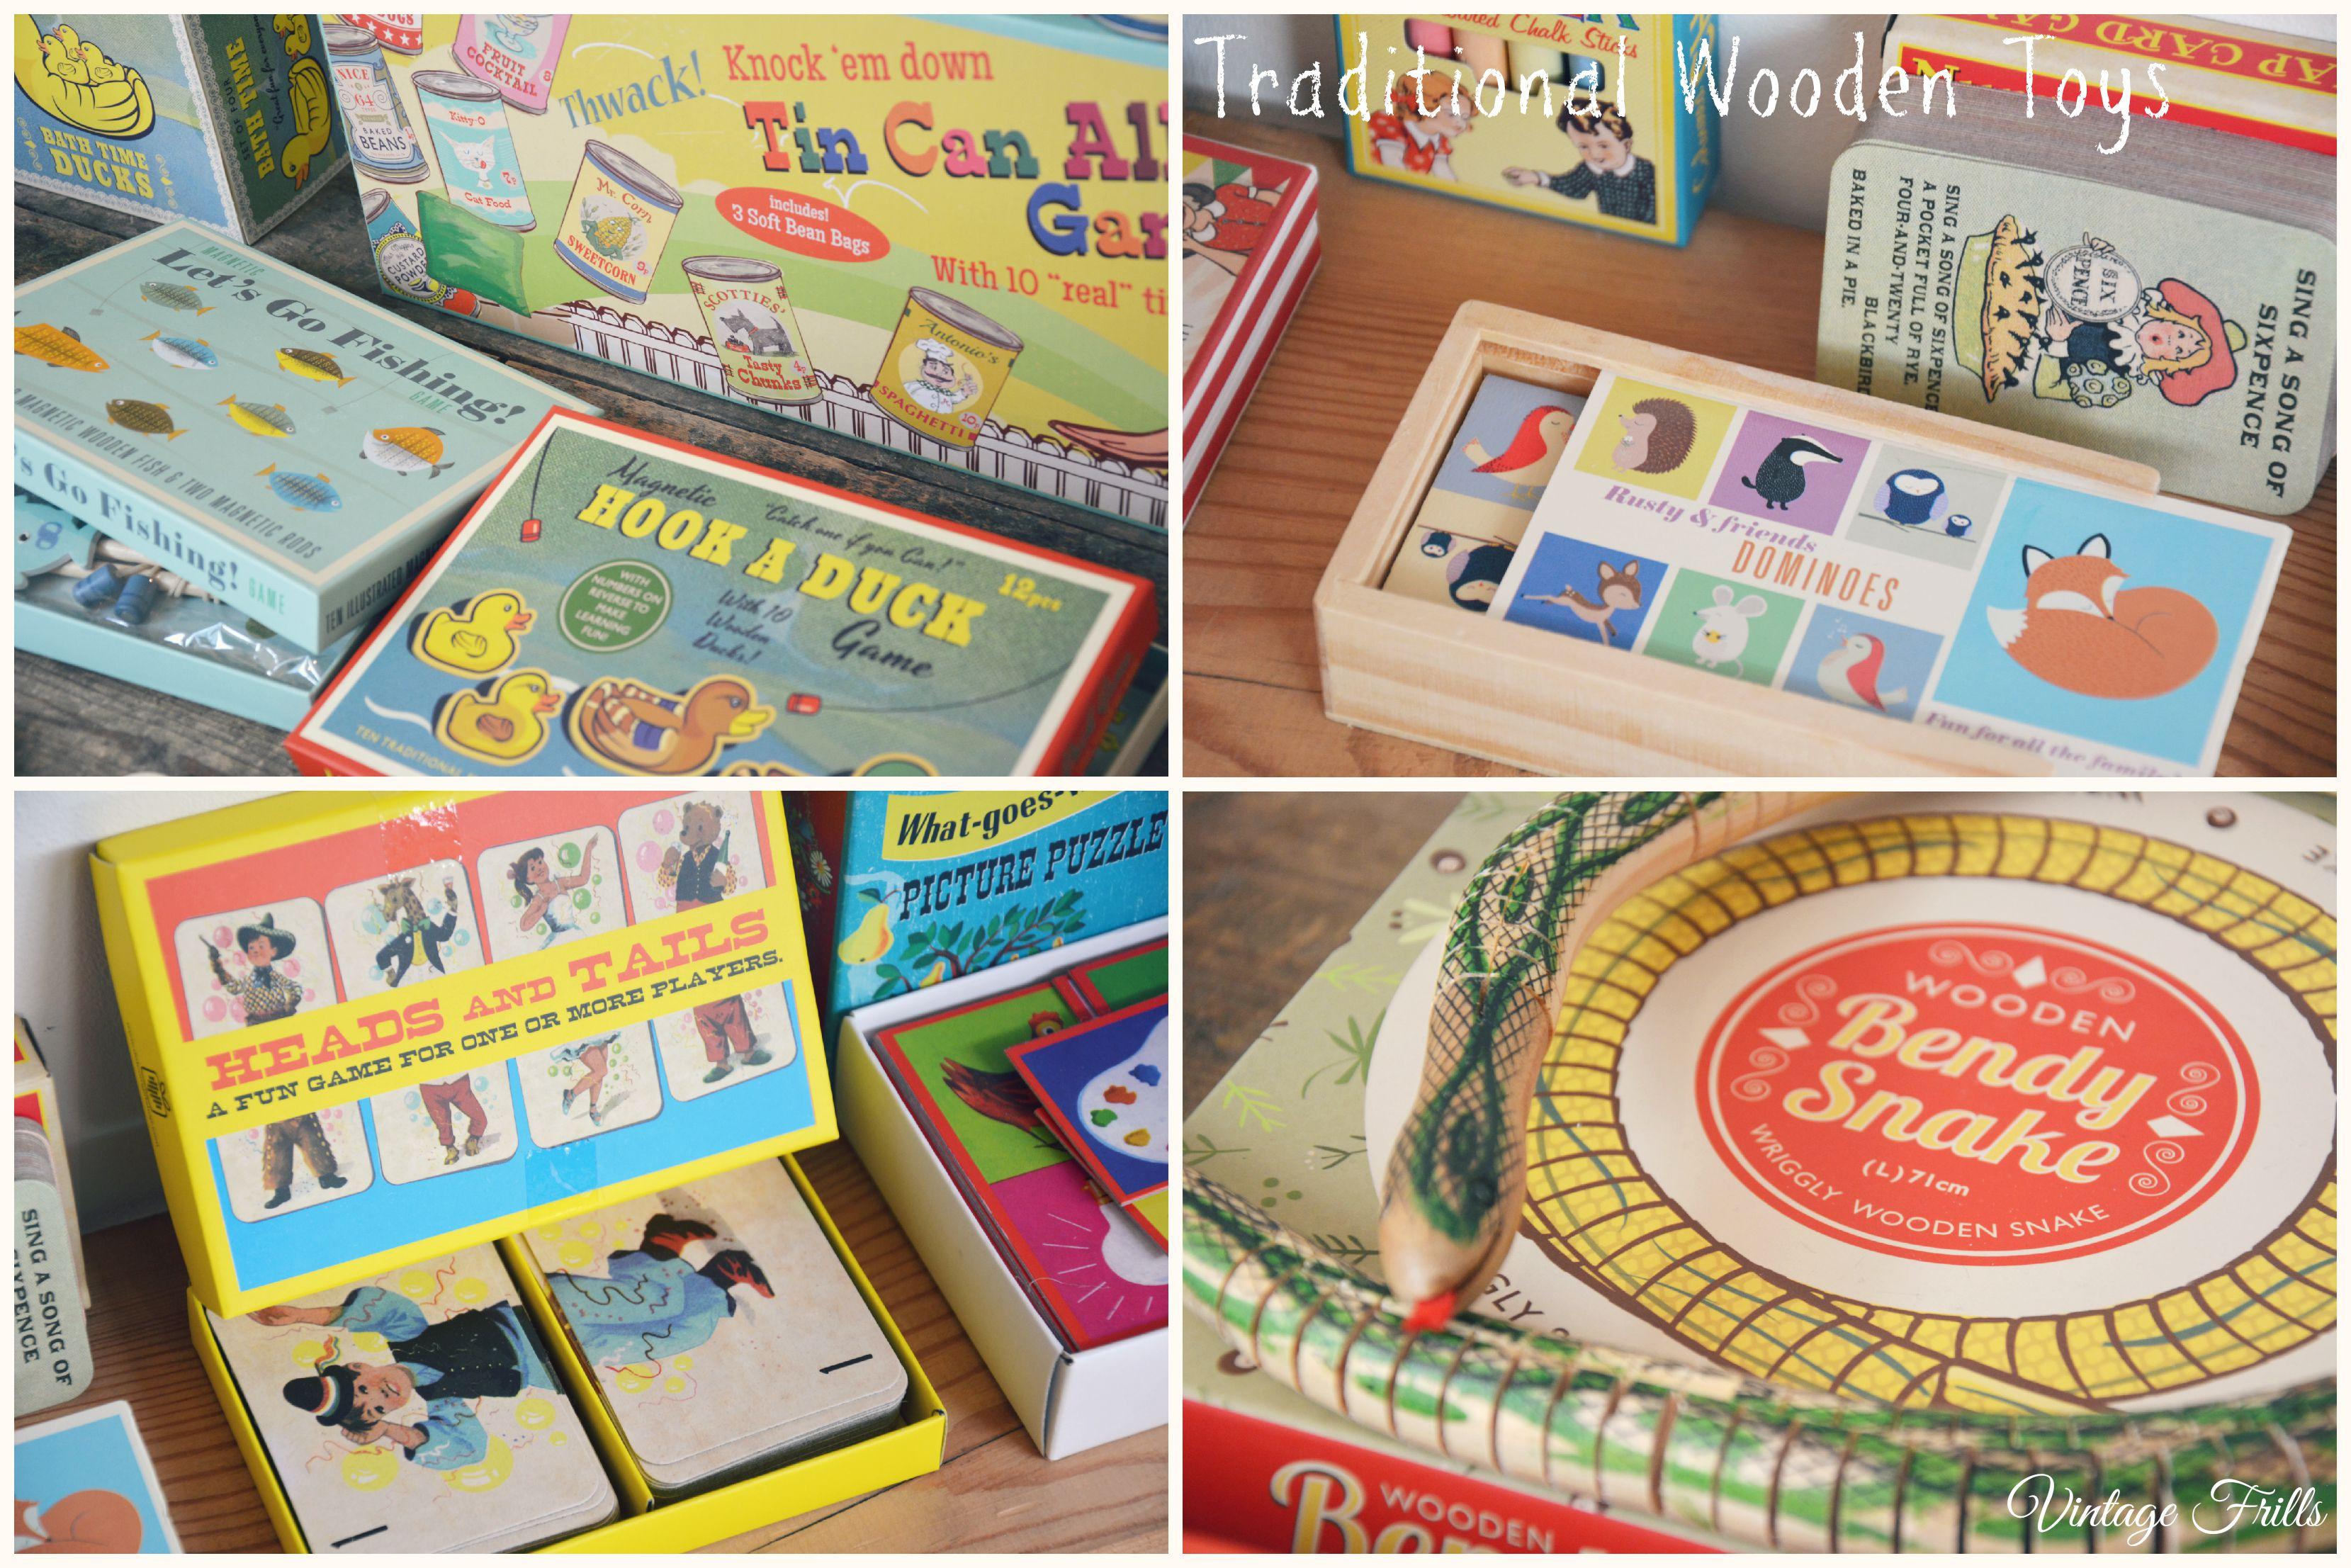 Traditional Wooden Toys Dot Com Gift Shop  Vintage Frills